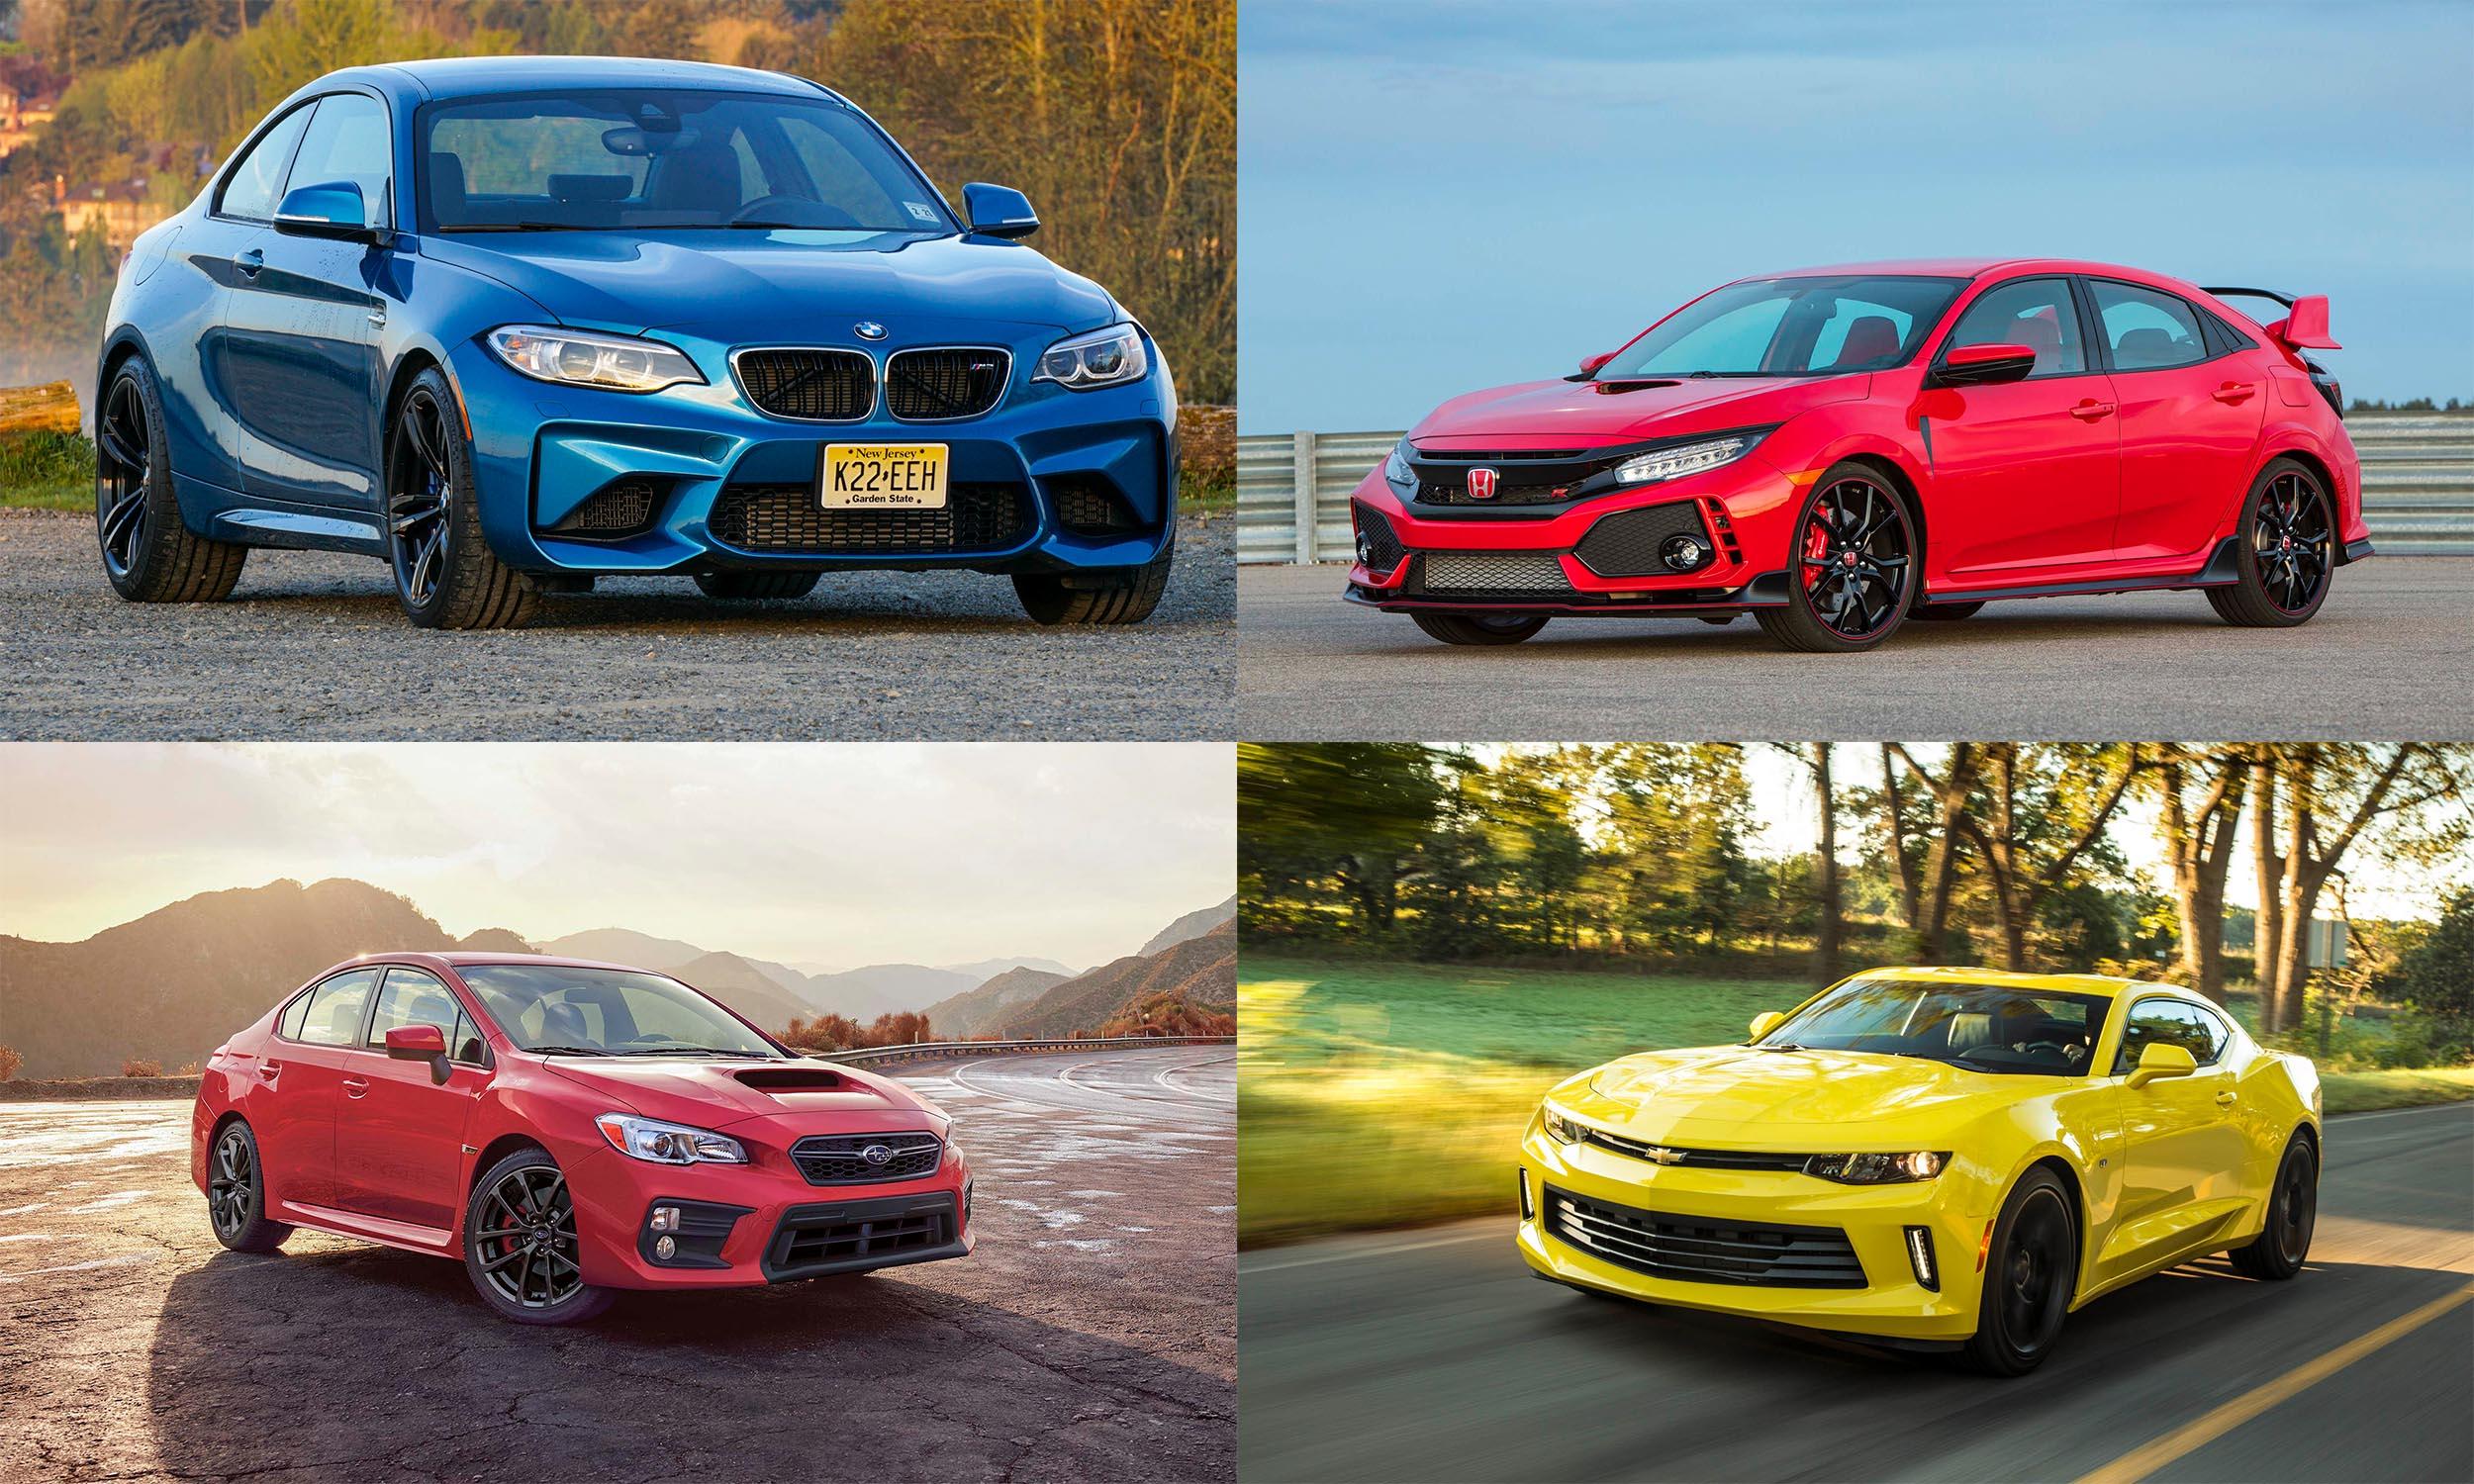 © Automotive Content Experience, © Subaru of America, © American Honda Motors, © General Motors